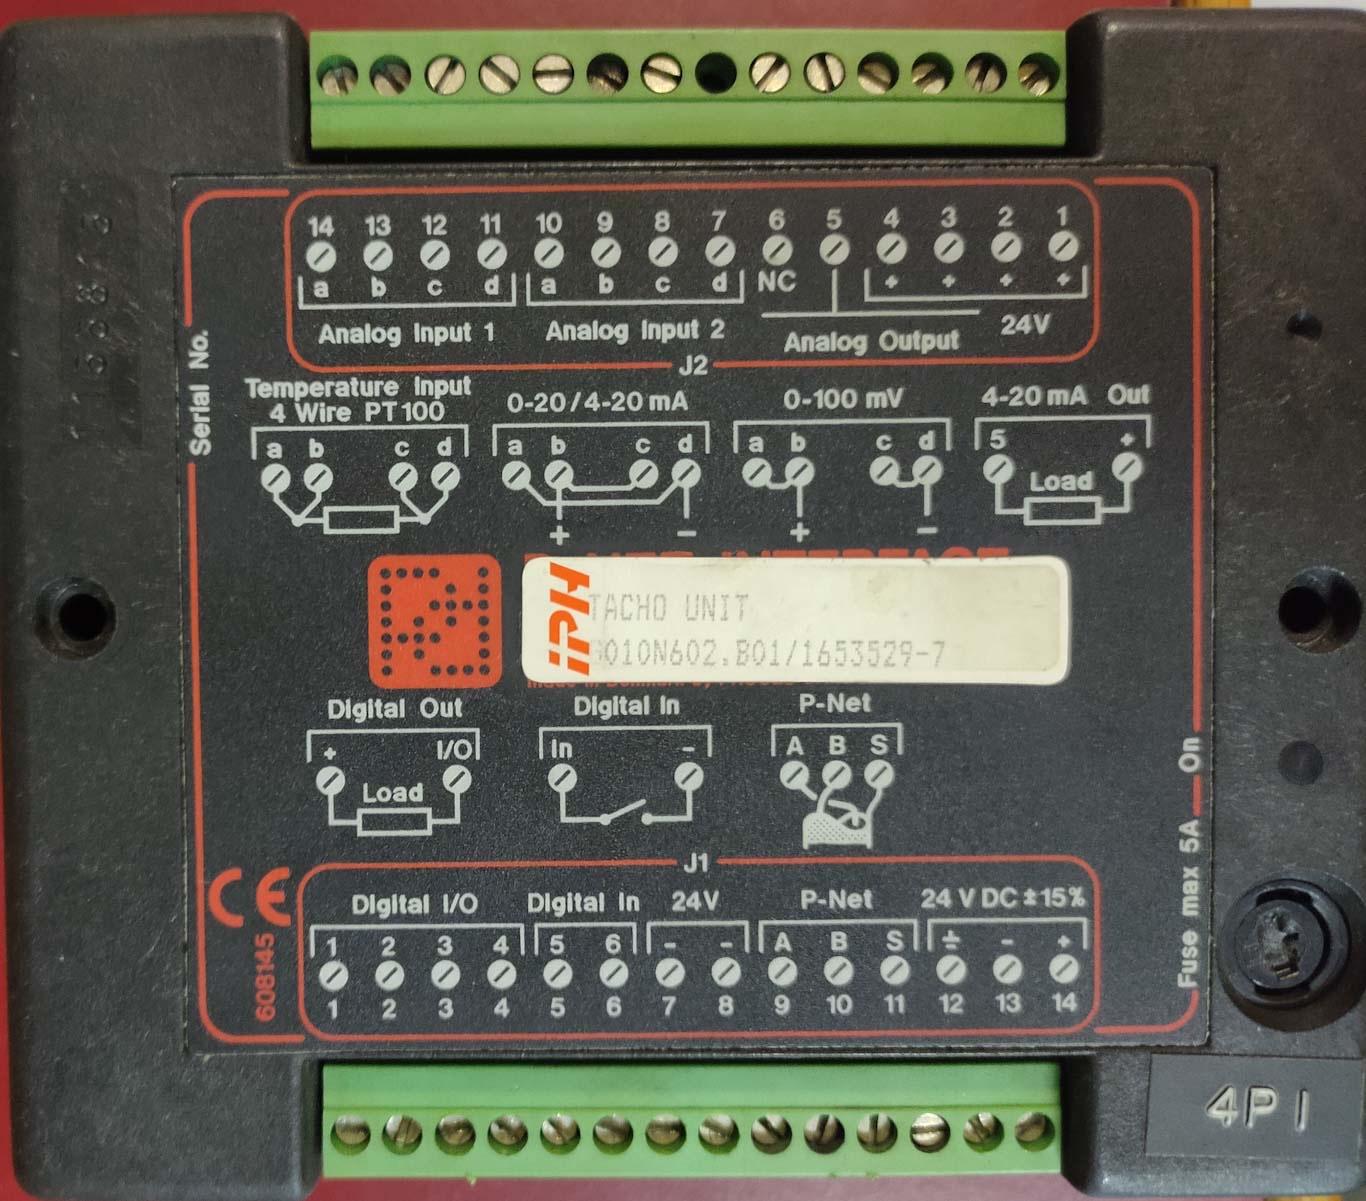 Speed Converter Tacho Unit 1653529-7